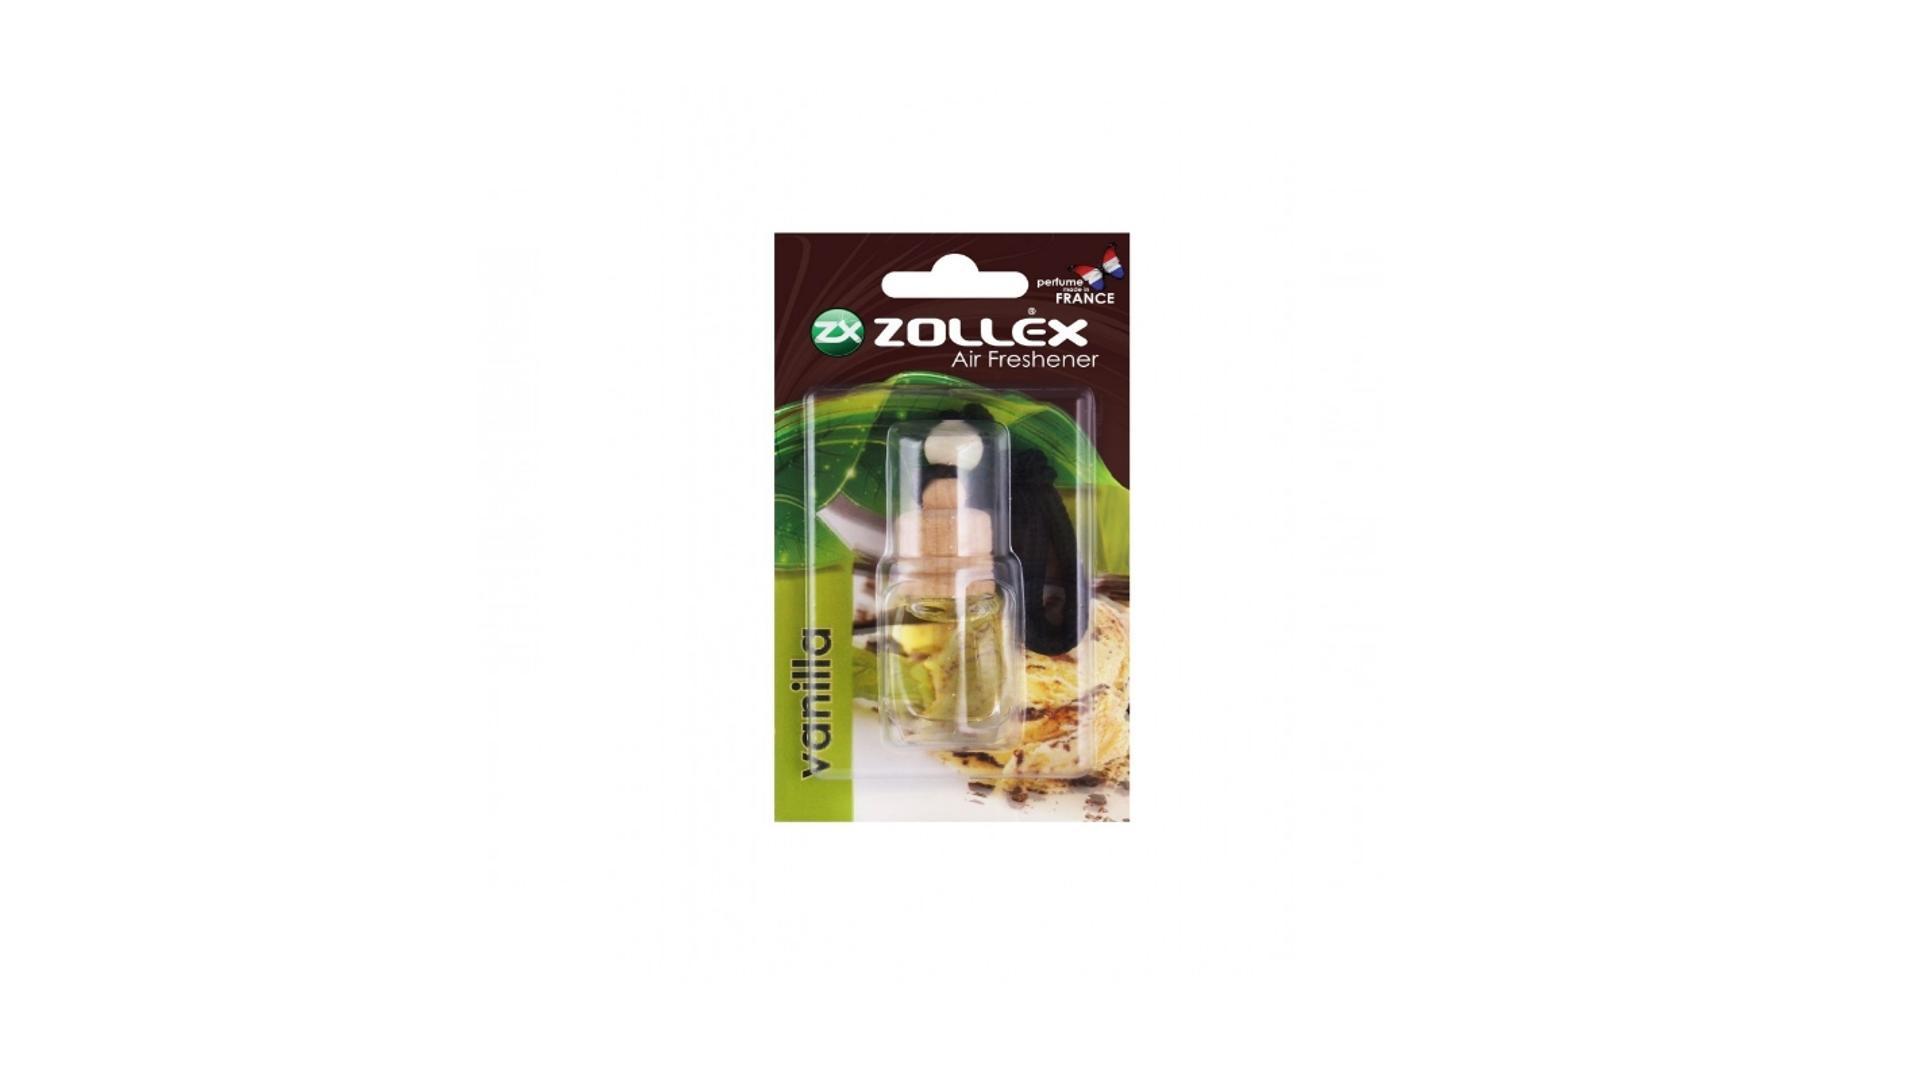 ZOLLEX Osvěžovač vzduchu - vanilka 8 ml (17VA)